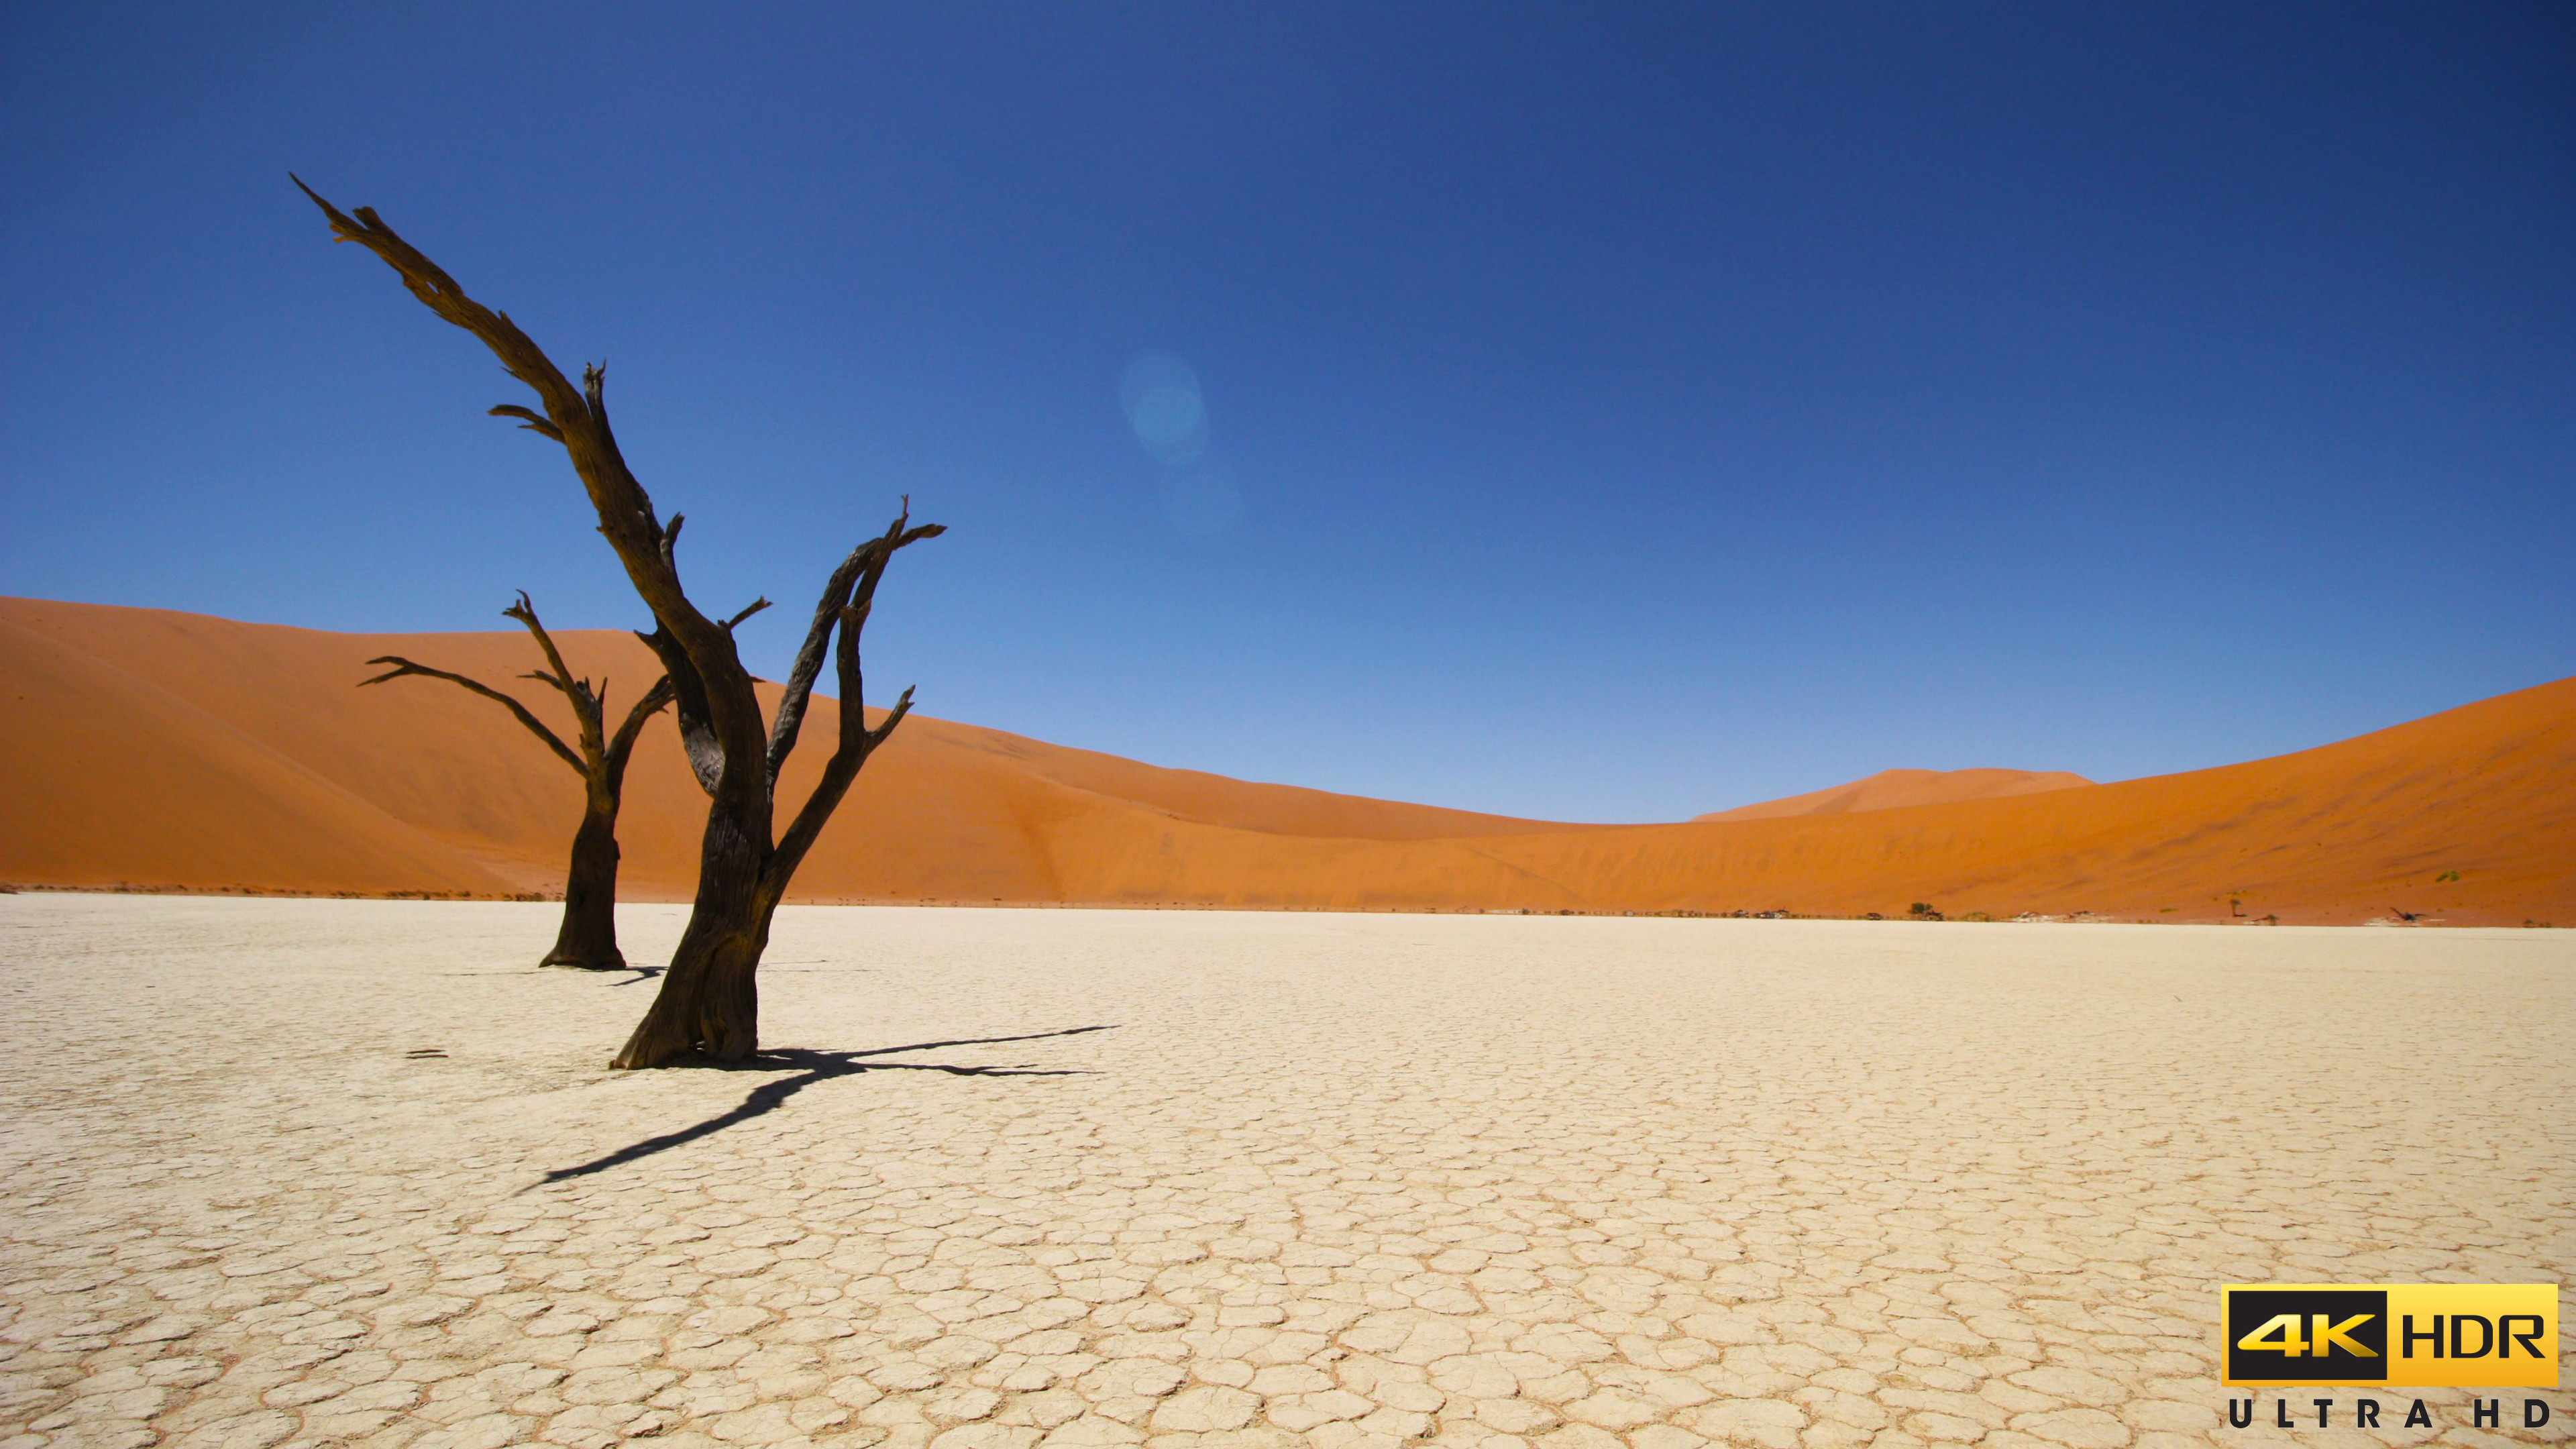 namib_coastal_desert_4k-3840x2160